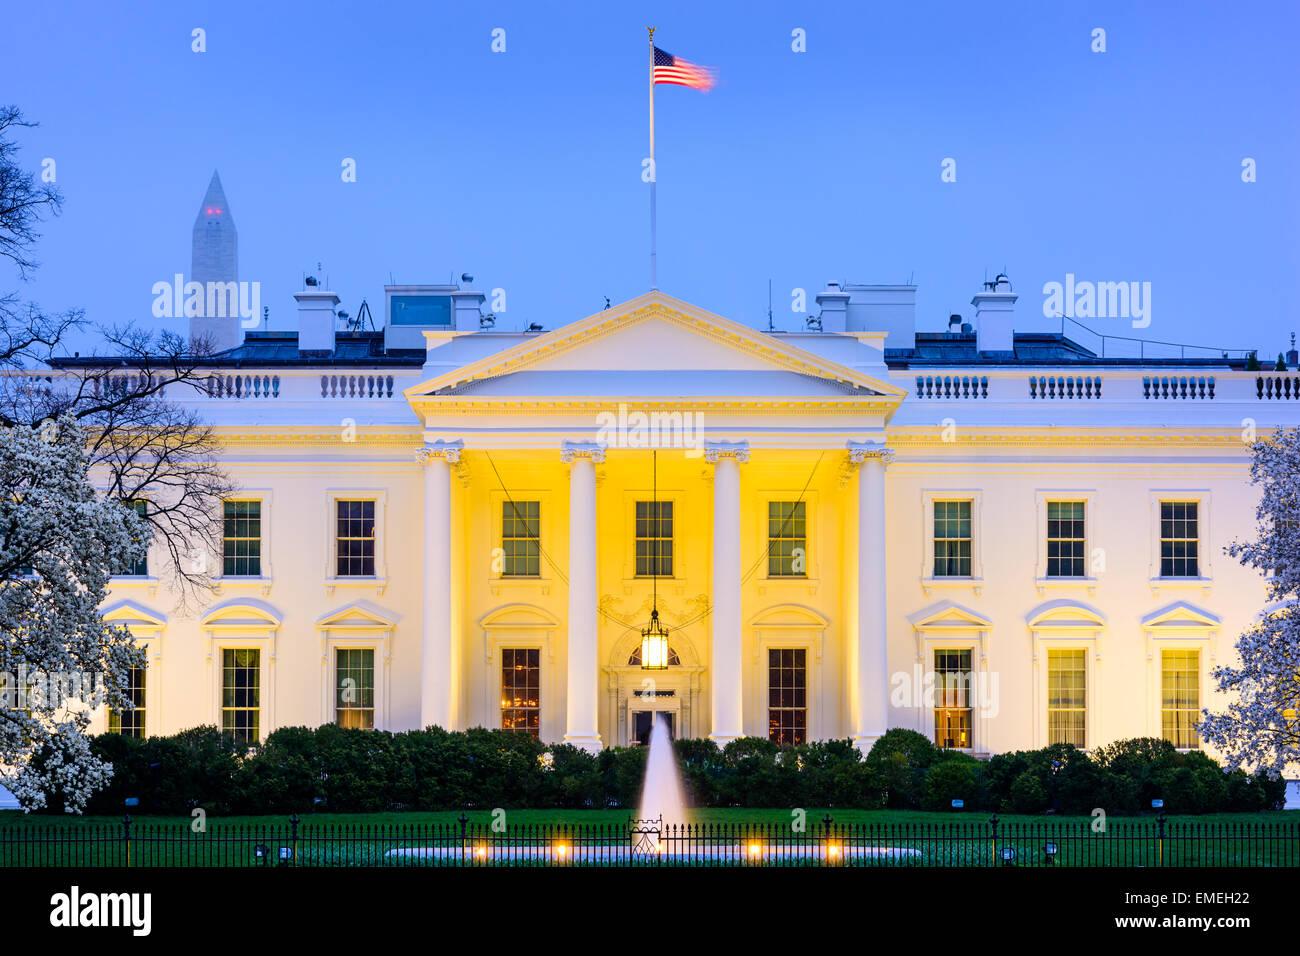 Washington, D.C. at the White House. - Stock Image